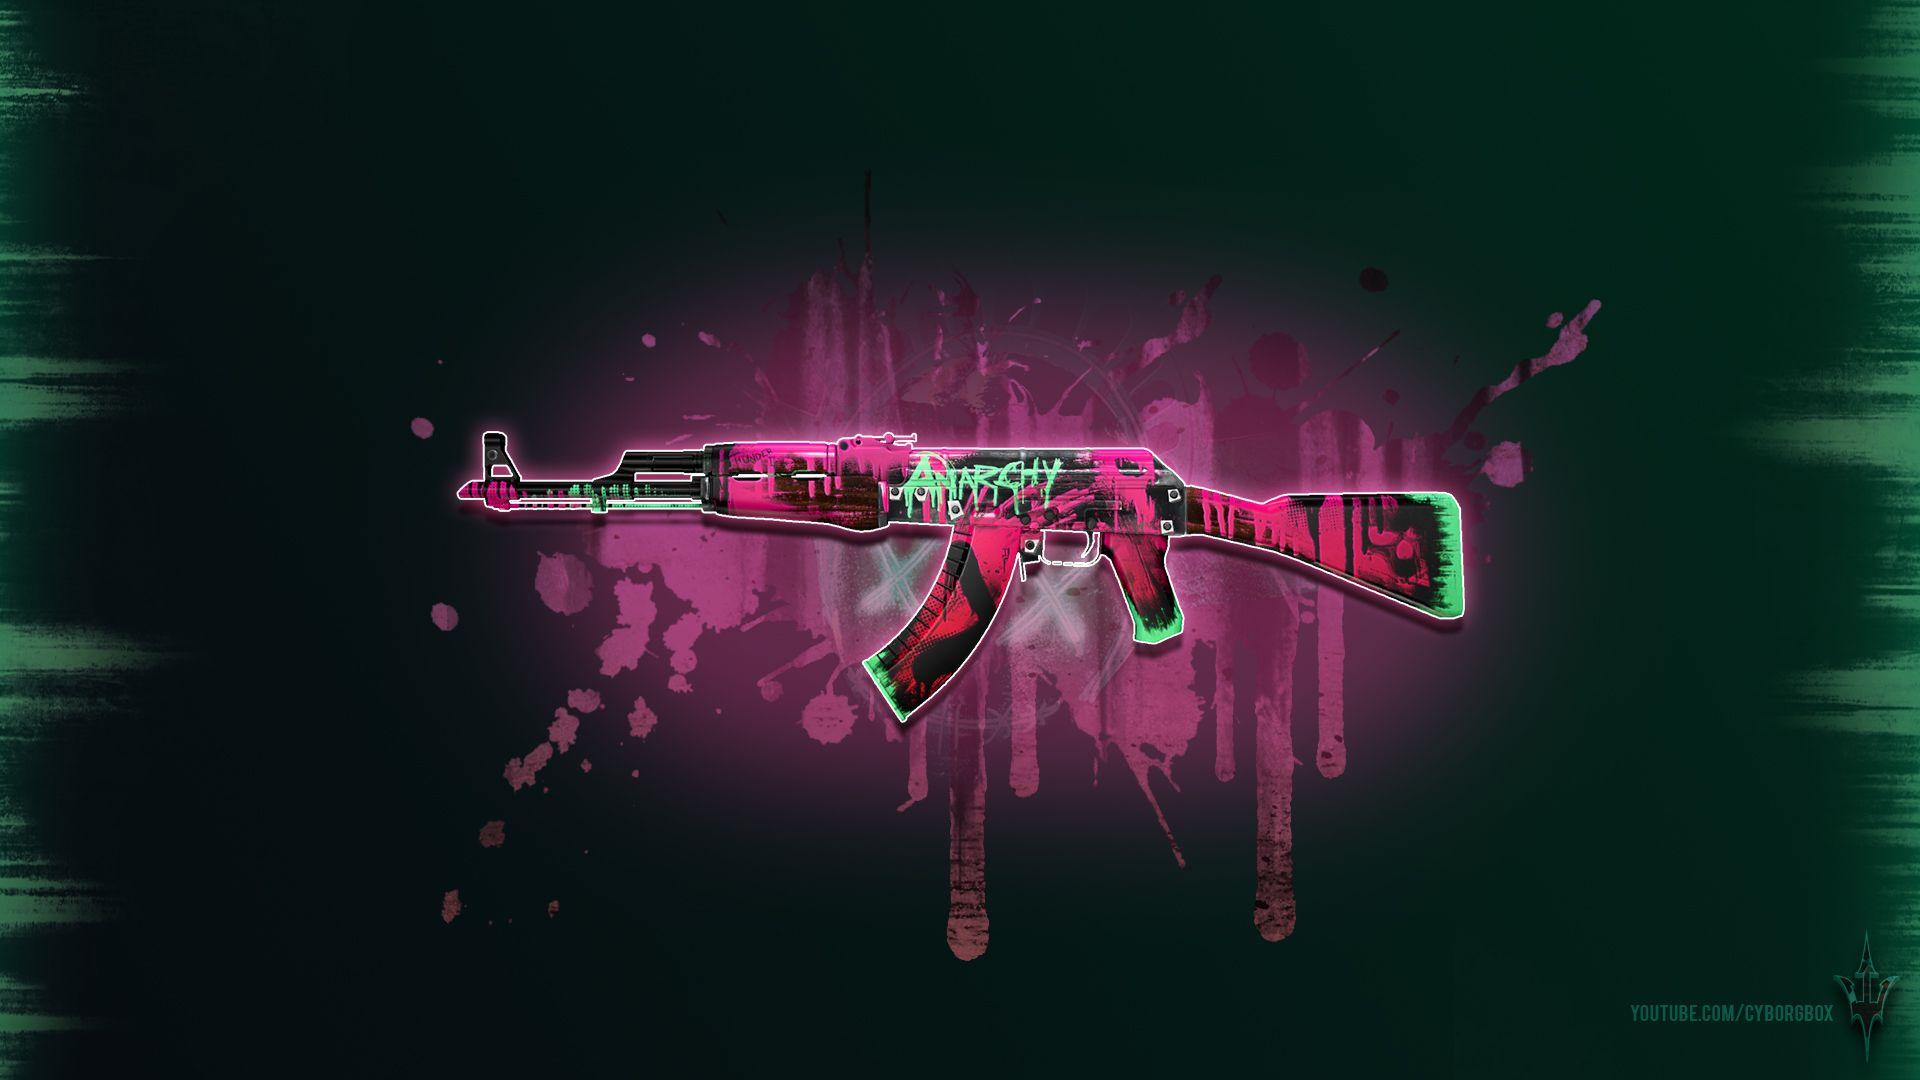 CSGO AK 47 Neon Revolution Wallpaper 1080p Weed Go wallpaper 1920x1080